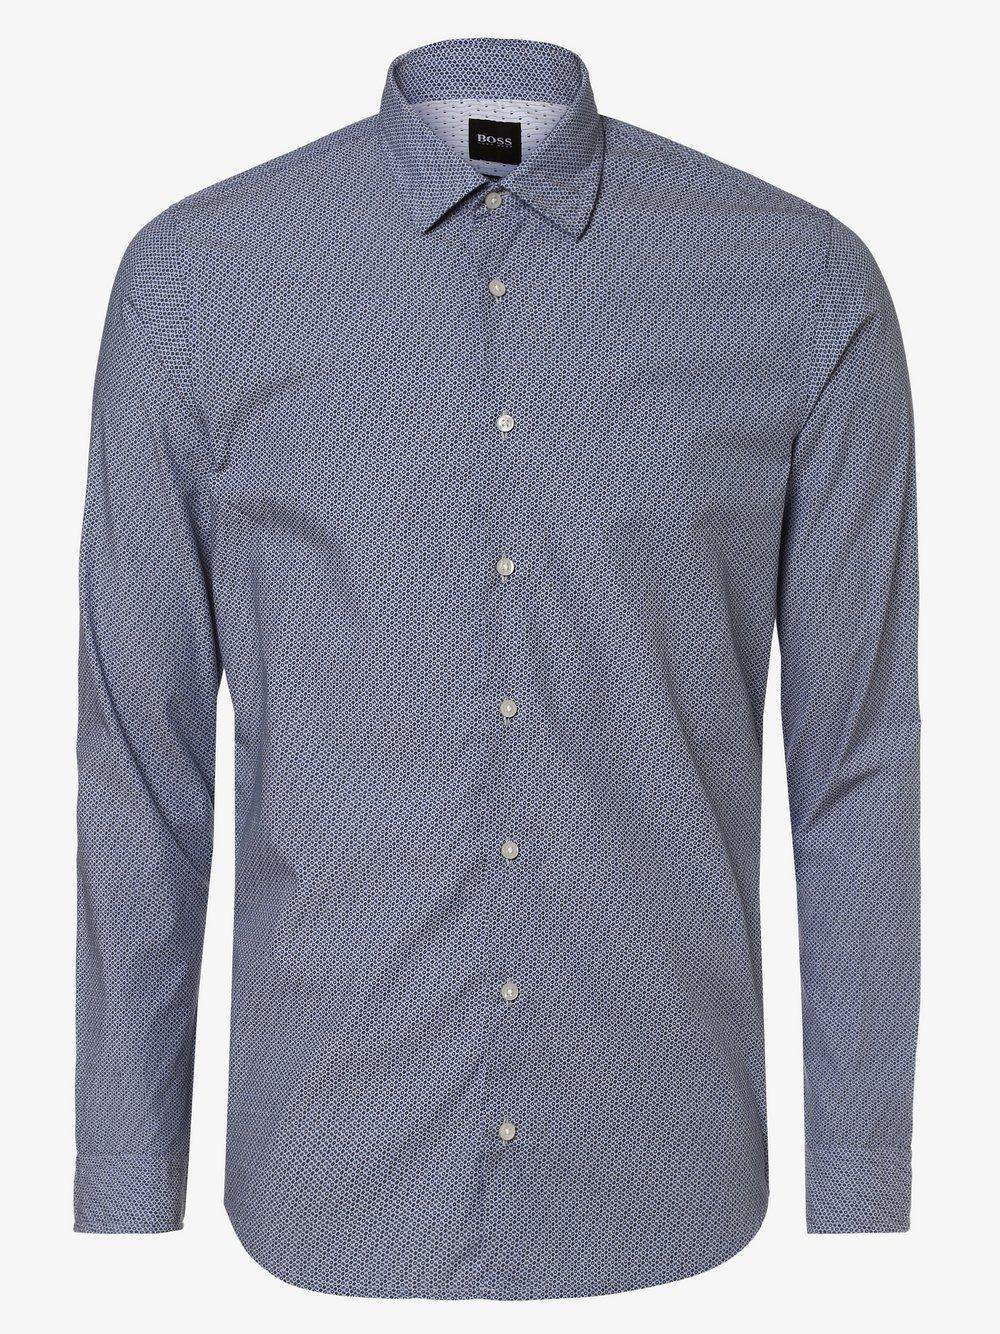 BOSS Casual – Koszula męska – Mypop_2, niebieski Van Graaf 455737-0001-09900